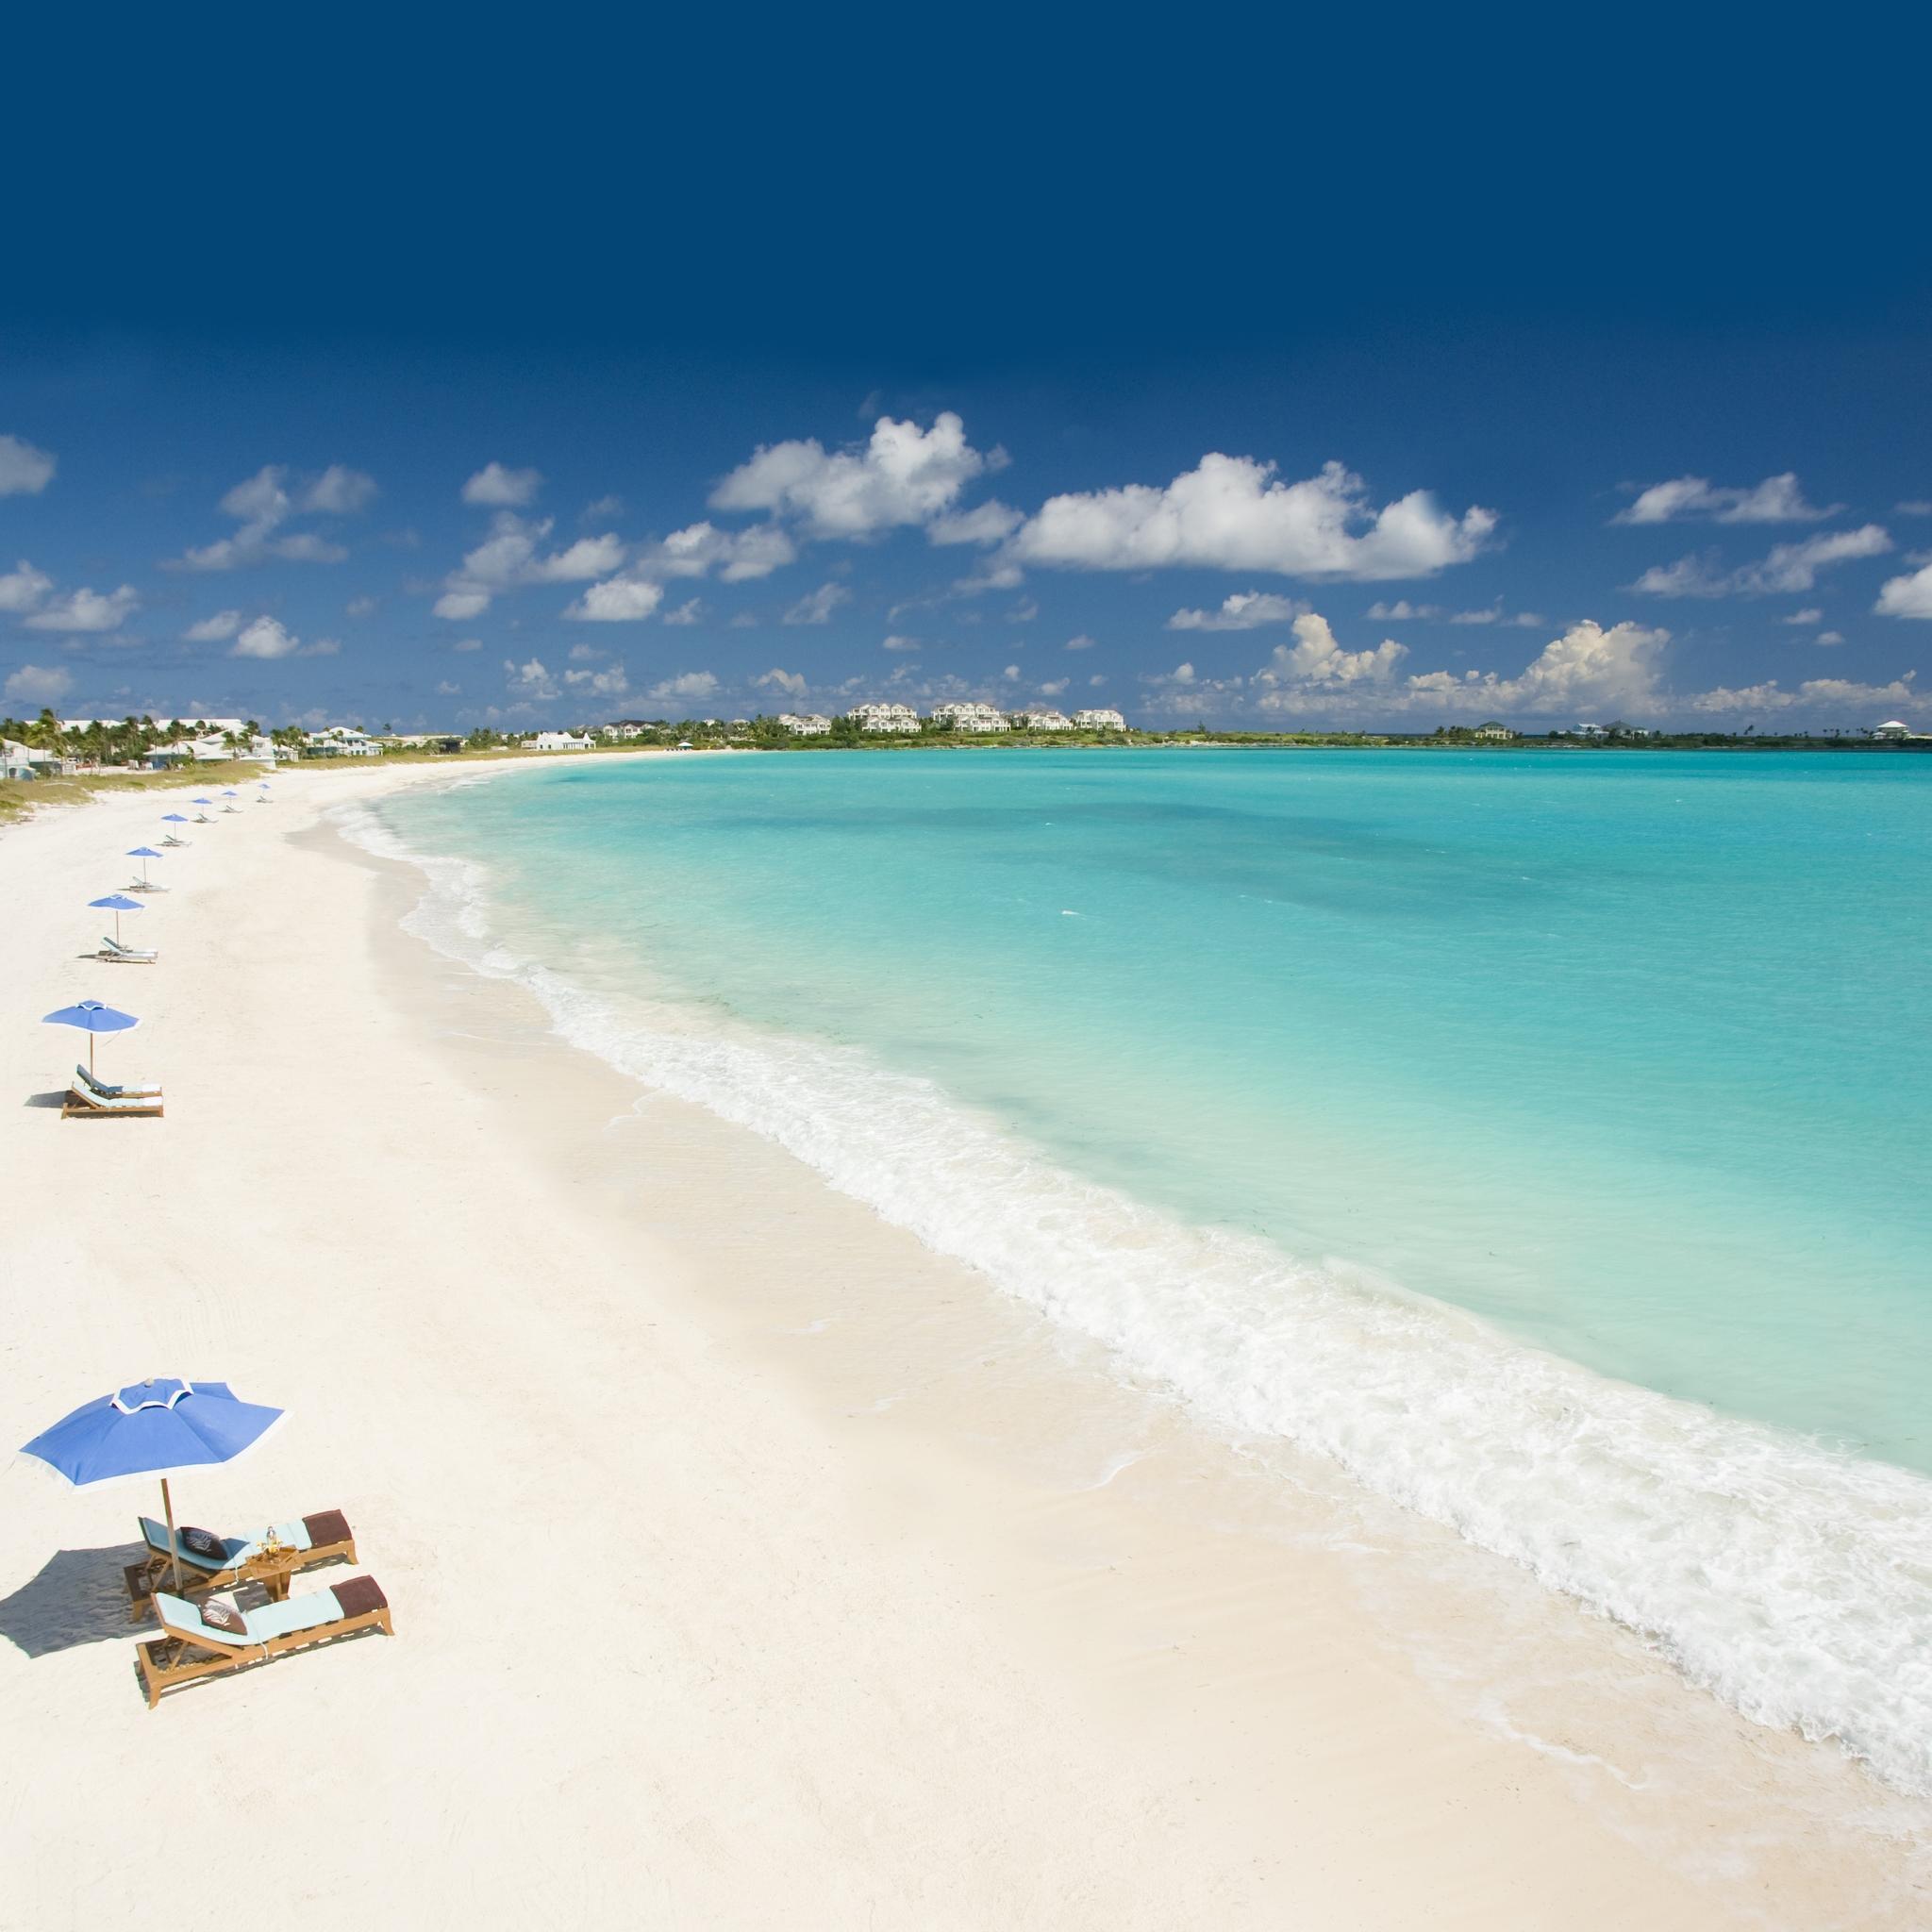 Caribbean Beach iPad Air Wallpaper Download iPhone Wallpapers iPad 2048x2048